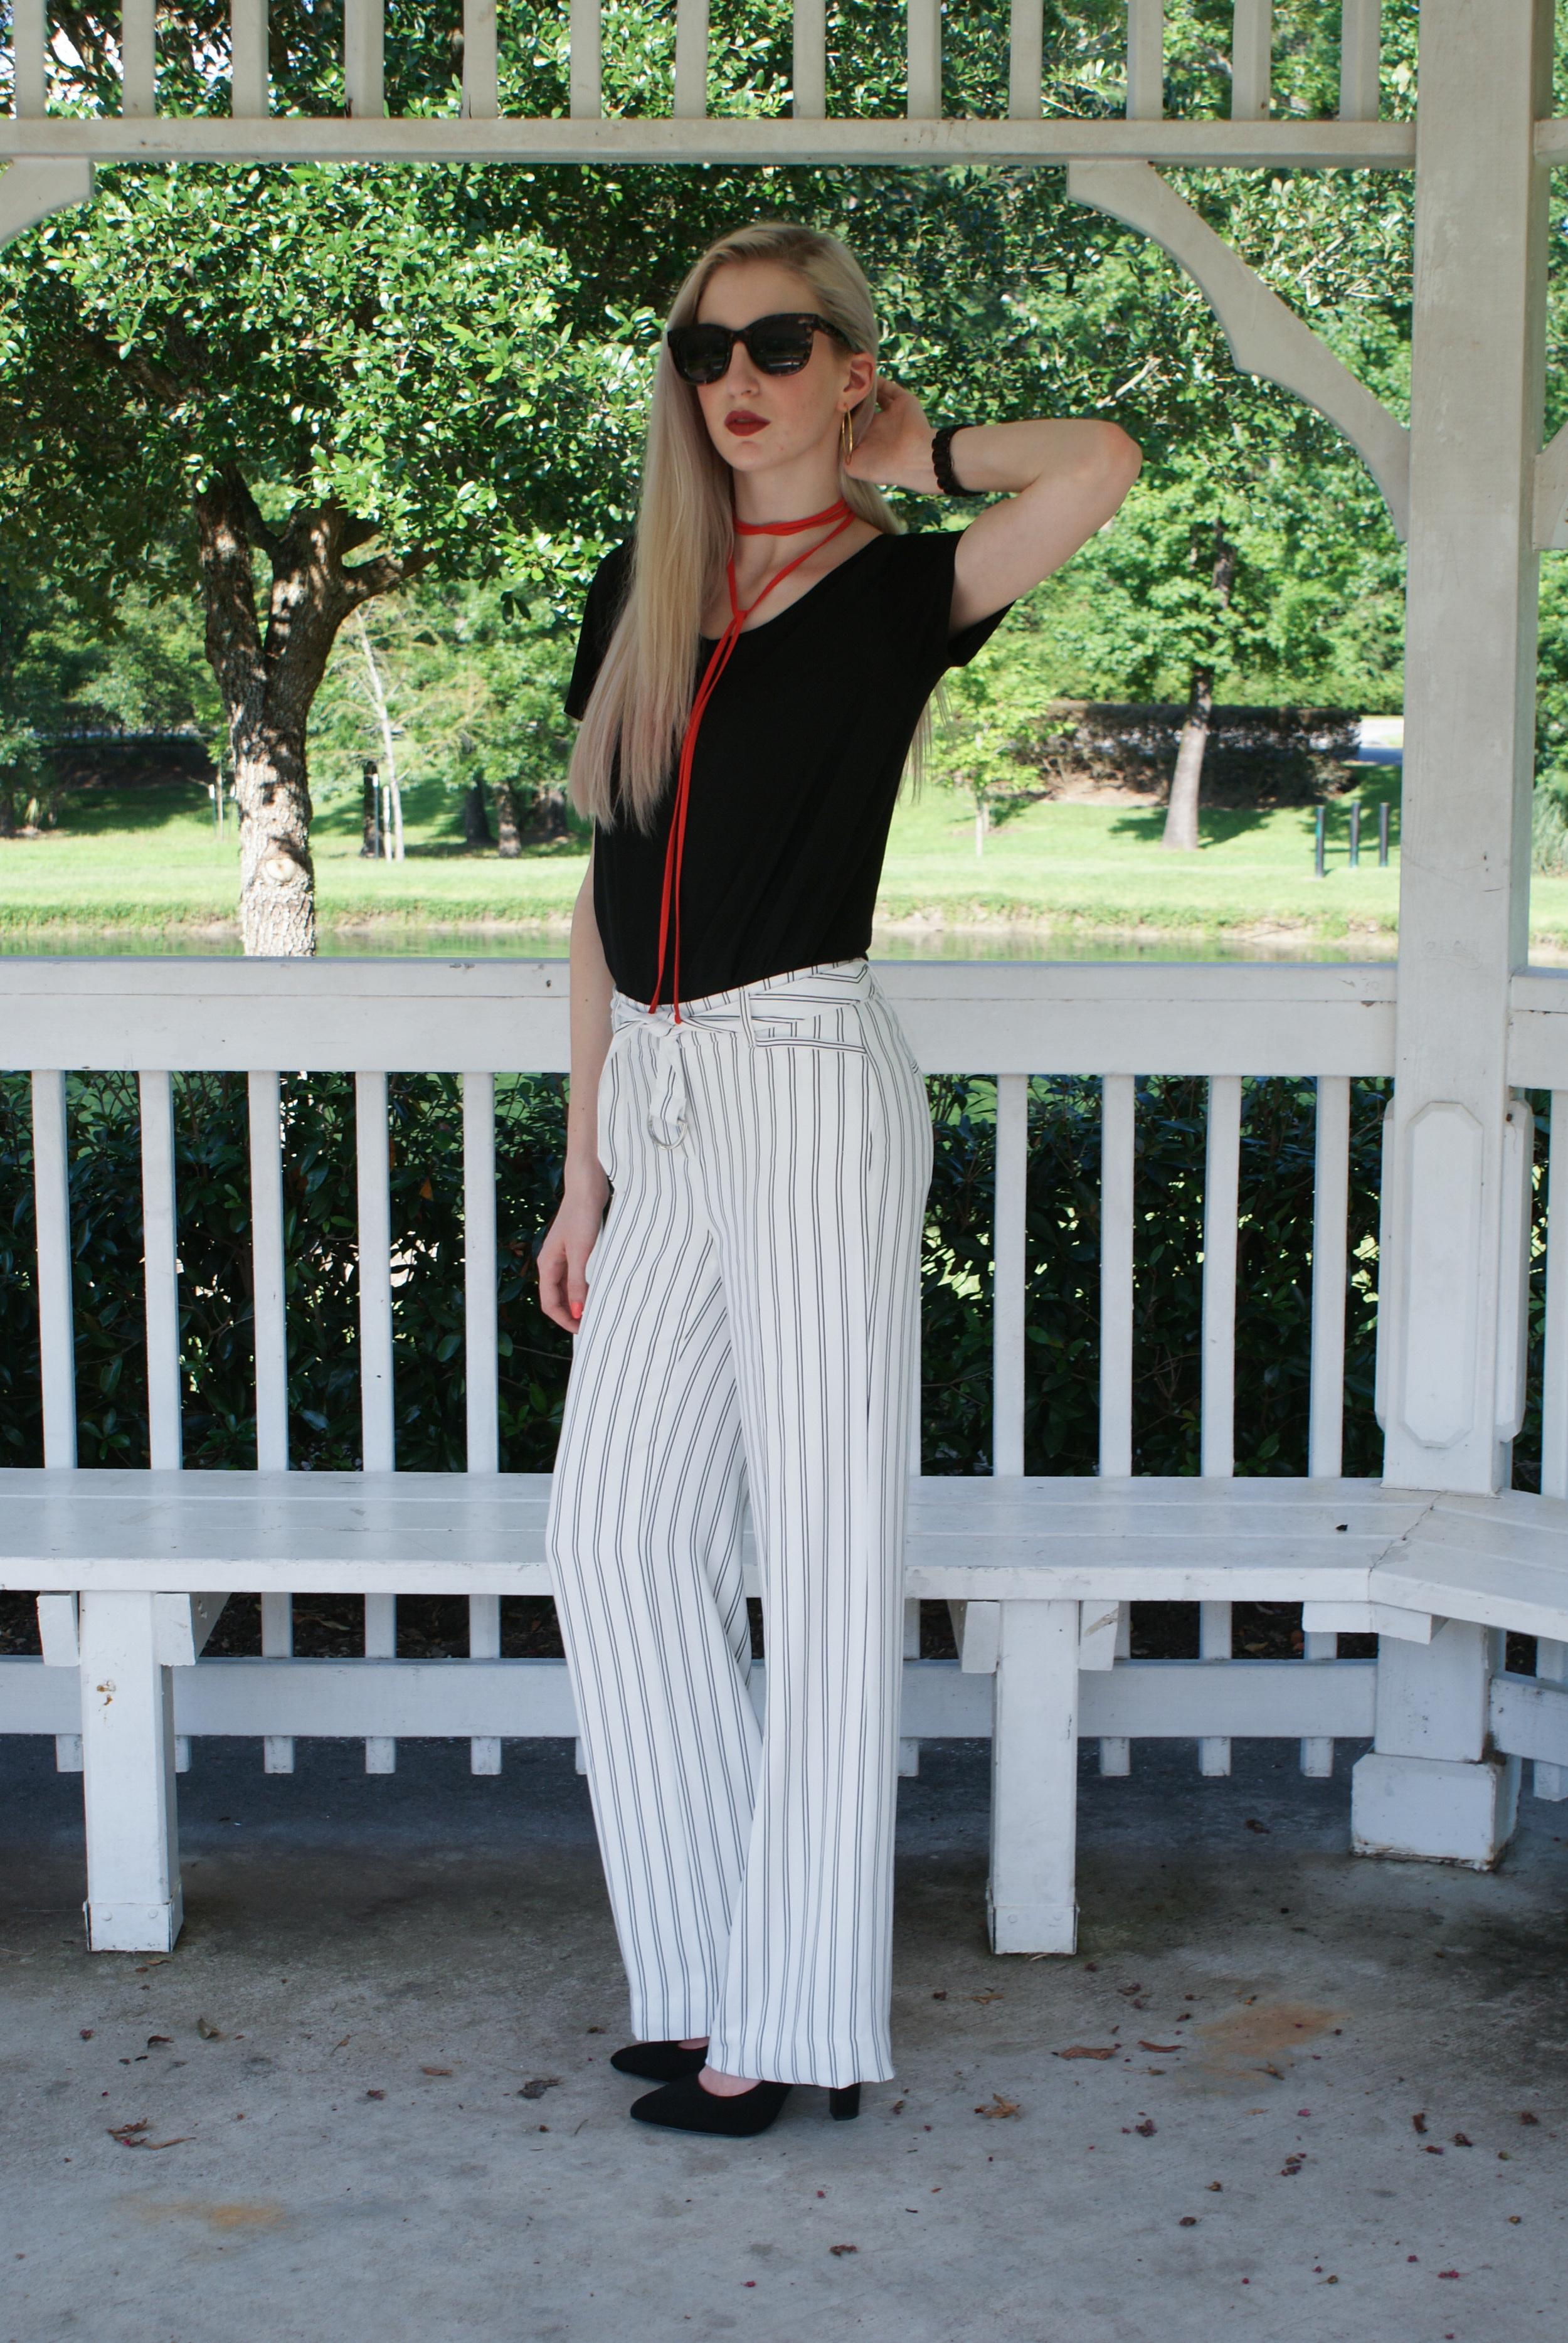 LOFT black tee, White House Black Market 70's style wide leg striped pants, pointed toe pump heel, long collar tie necklace, gold hoop earrings, clinique cola pop lipstick, tim ryan fringe jacket